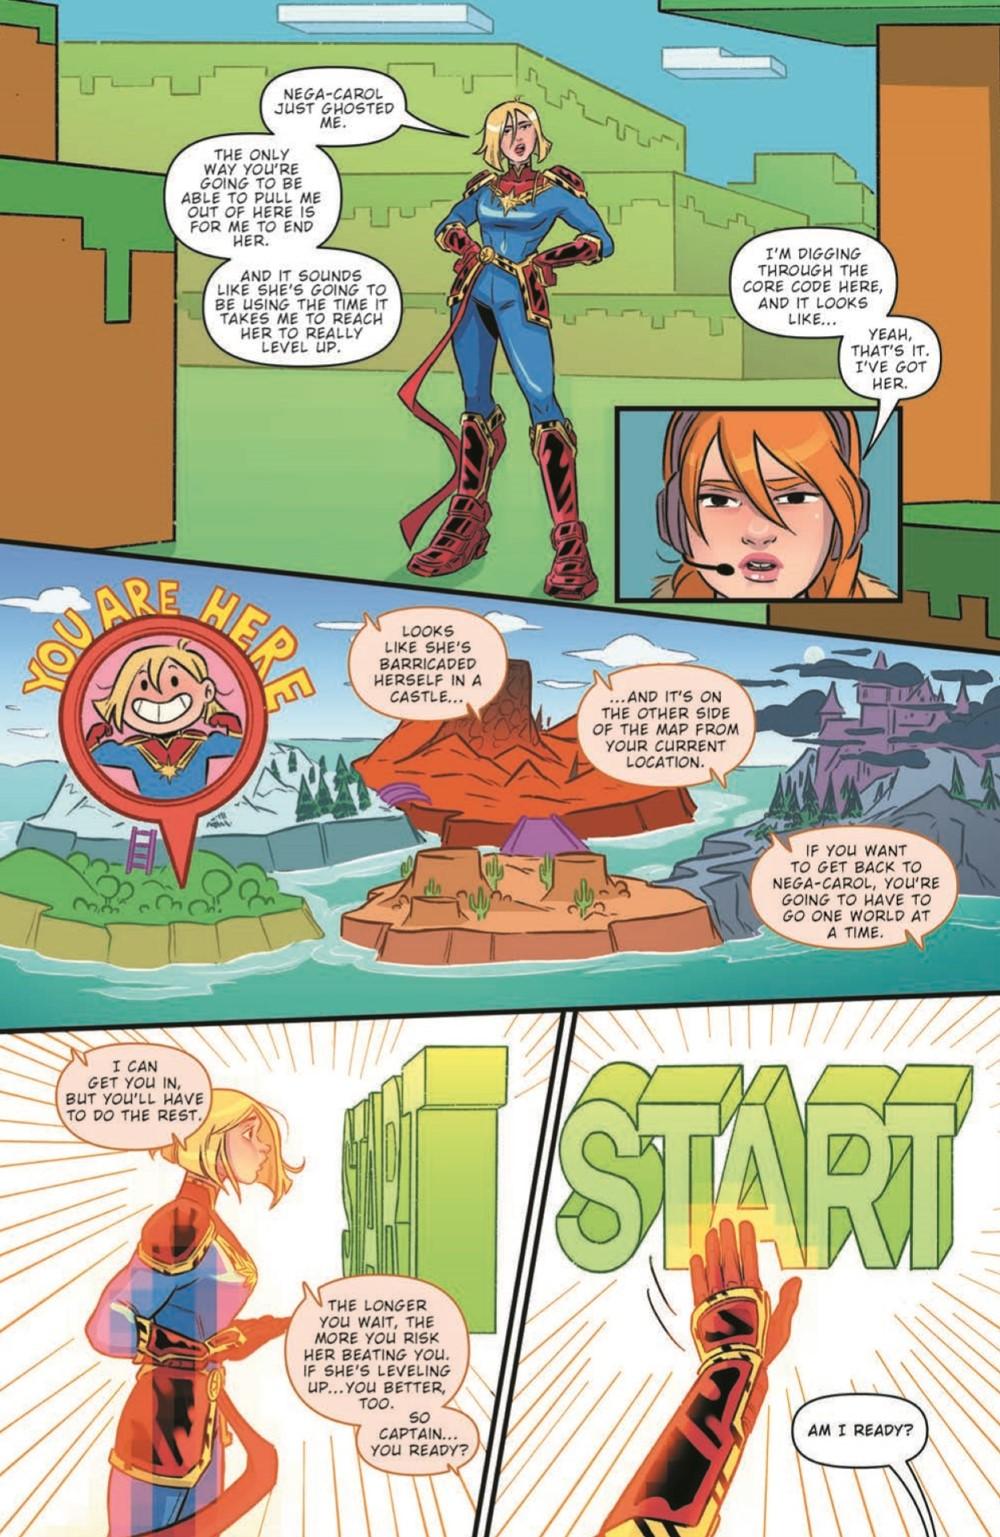 CaptainMarvel2_05_pr-5 ComicList Previews: MARVEL ACTION CAPTAIN MARVEL VOLUME 2 #5